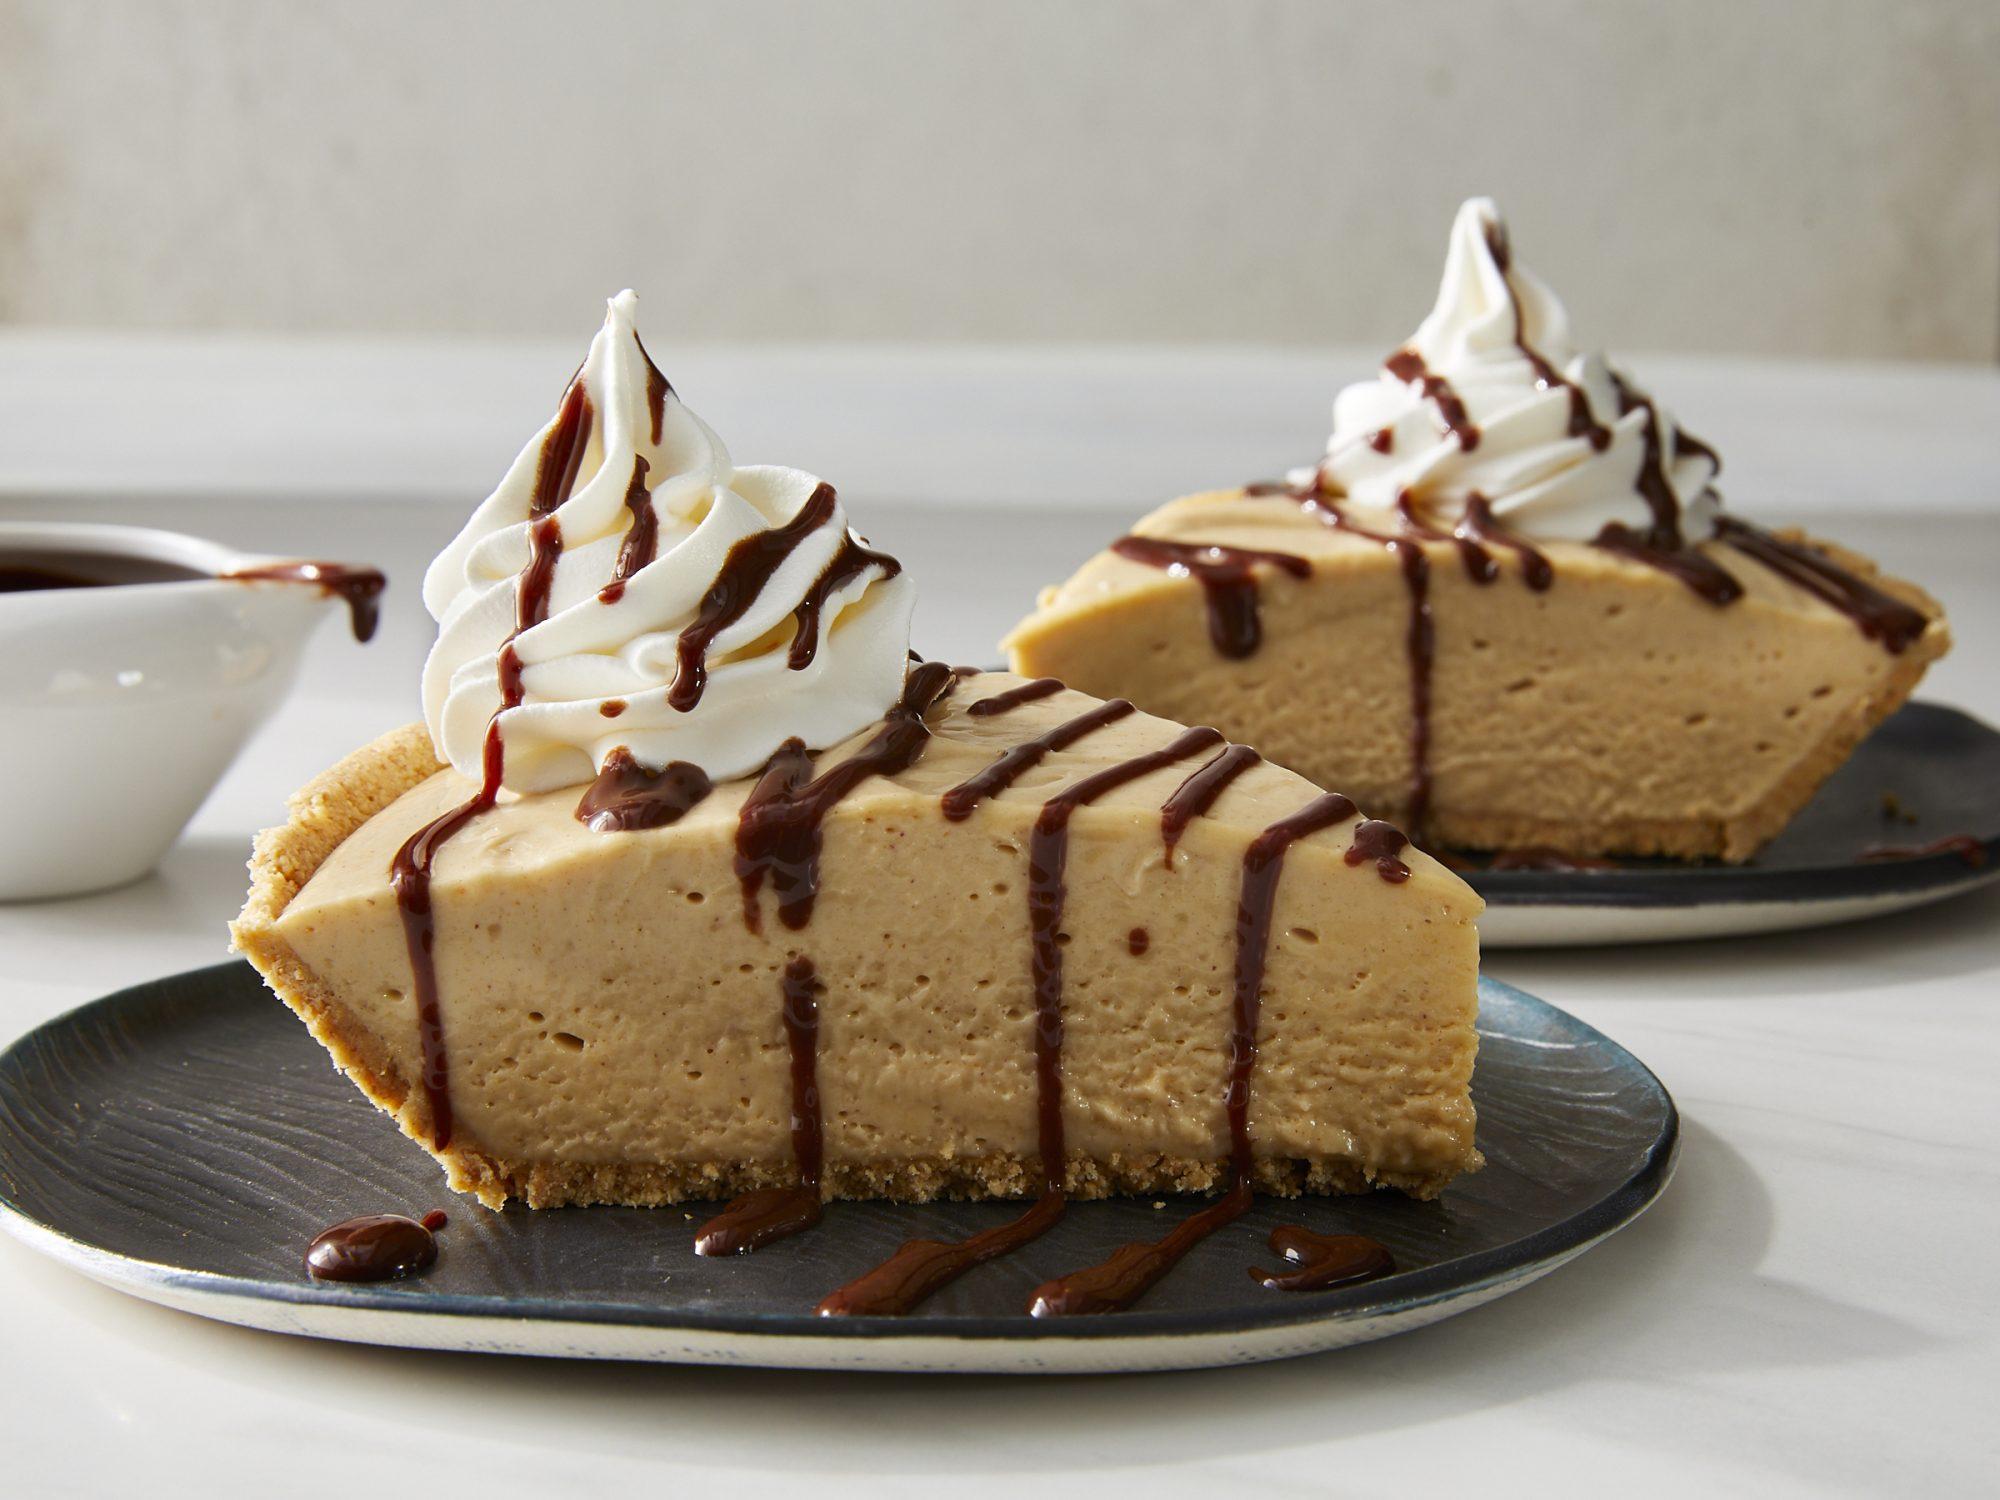 mr - Peanut Butter Pie Reshoot